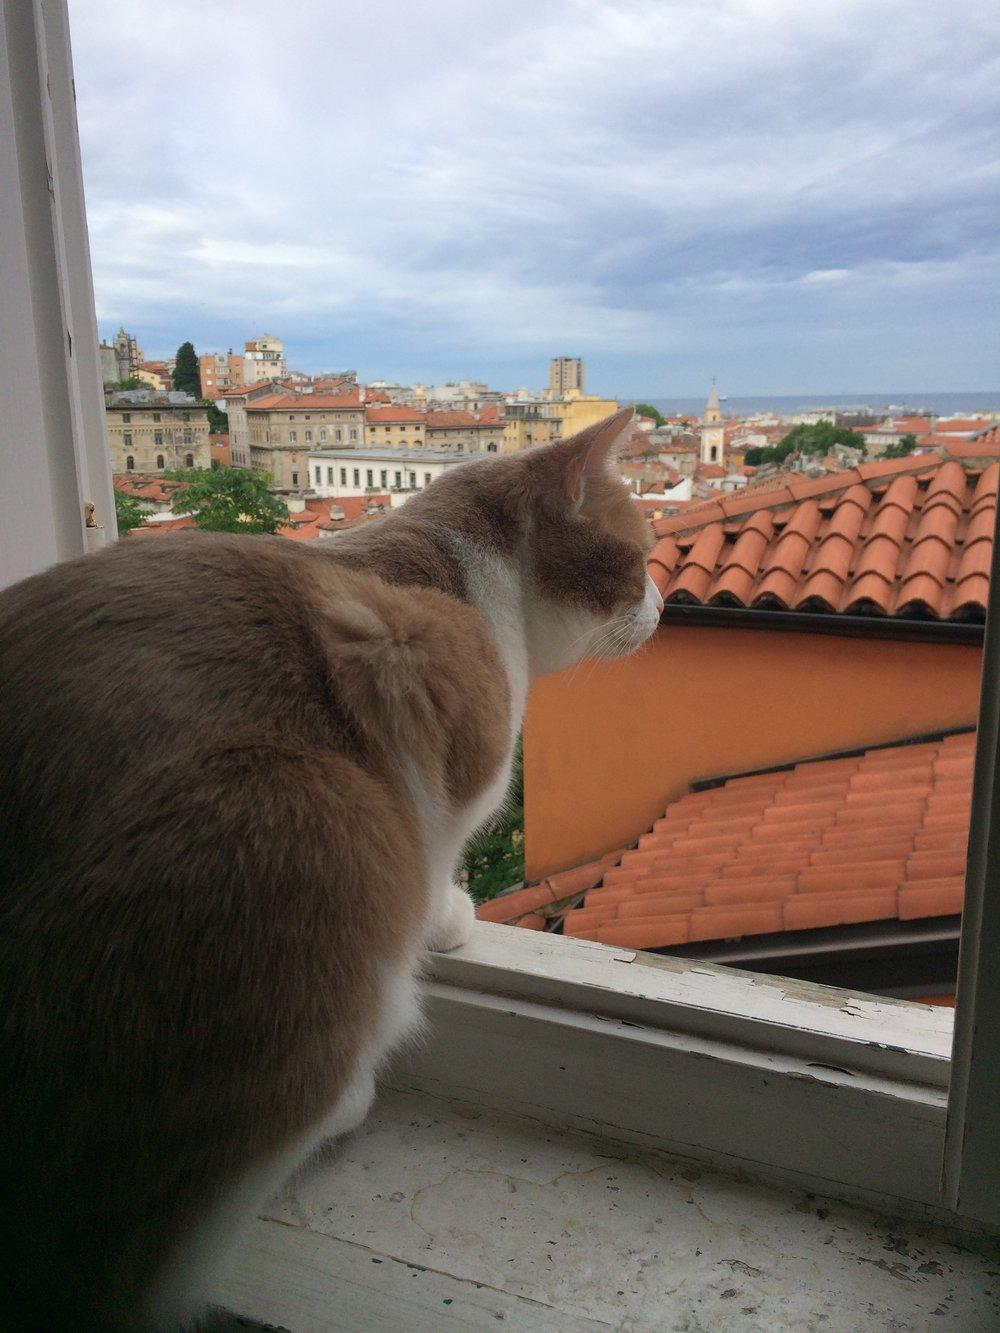 Attila ponders his next attack